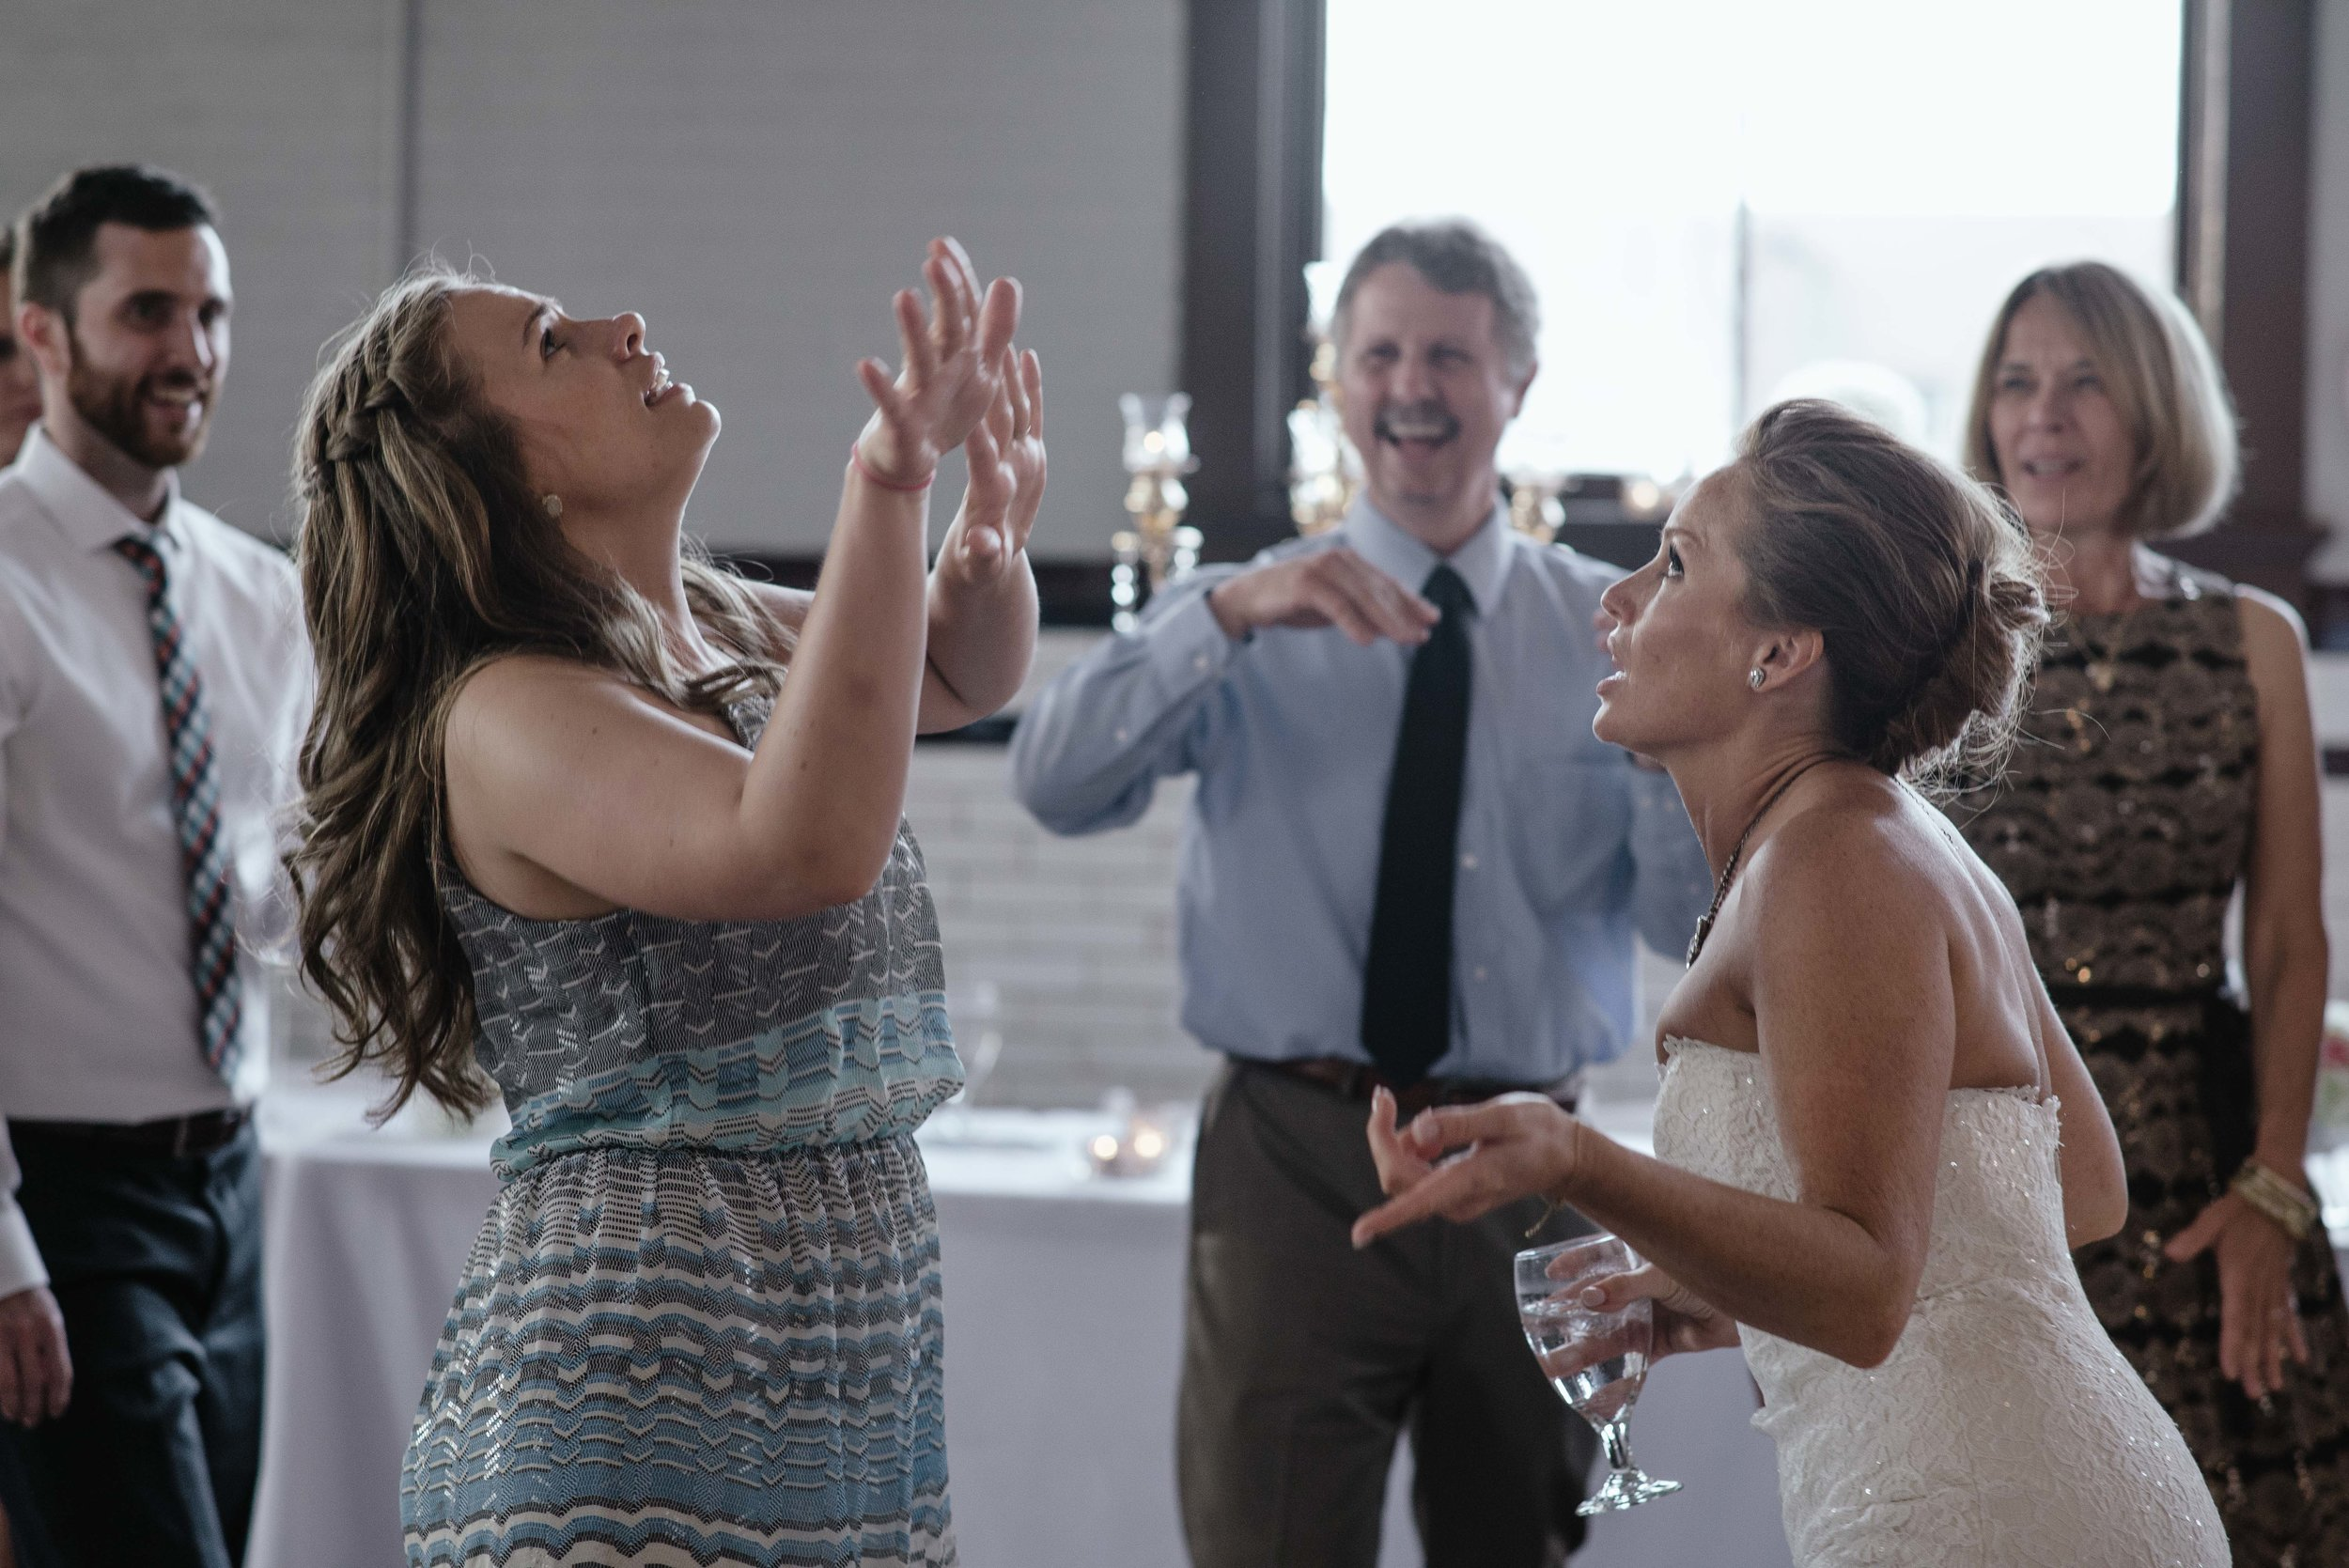 Mina-Steve-Blog-Indianapolis-Wedding-166.jpg